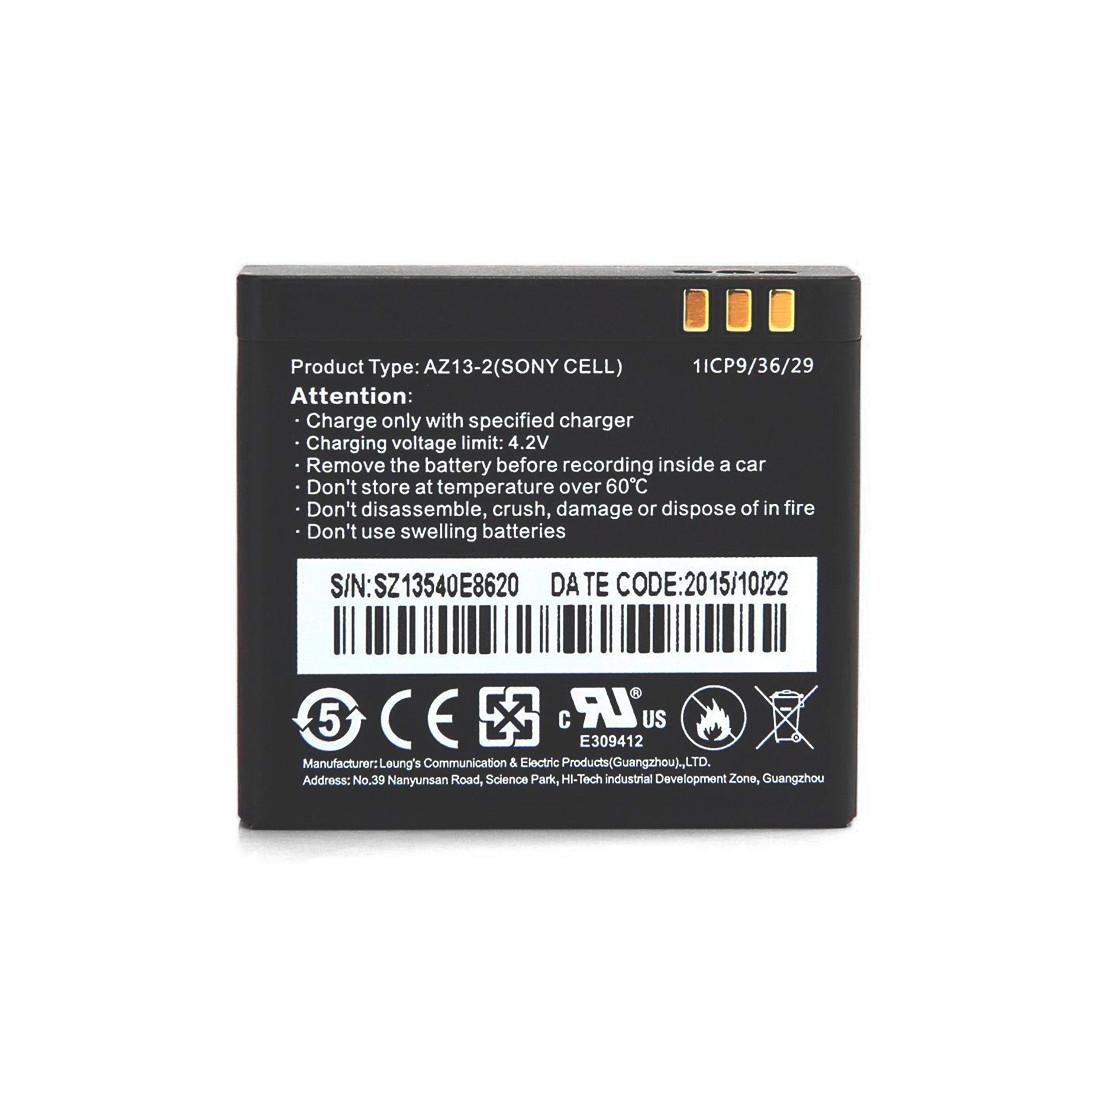 Батарея Xiaomi AZ13-2 для Xiaomi Yi экшен камеры (1010mAh, 3.7V, Black)